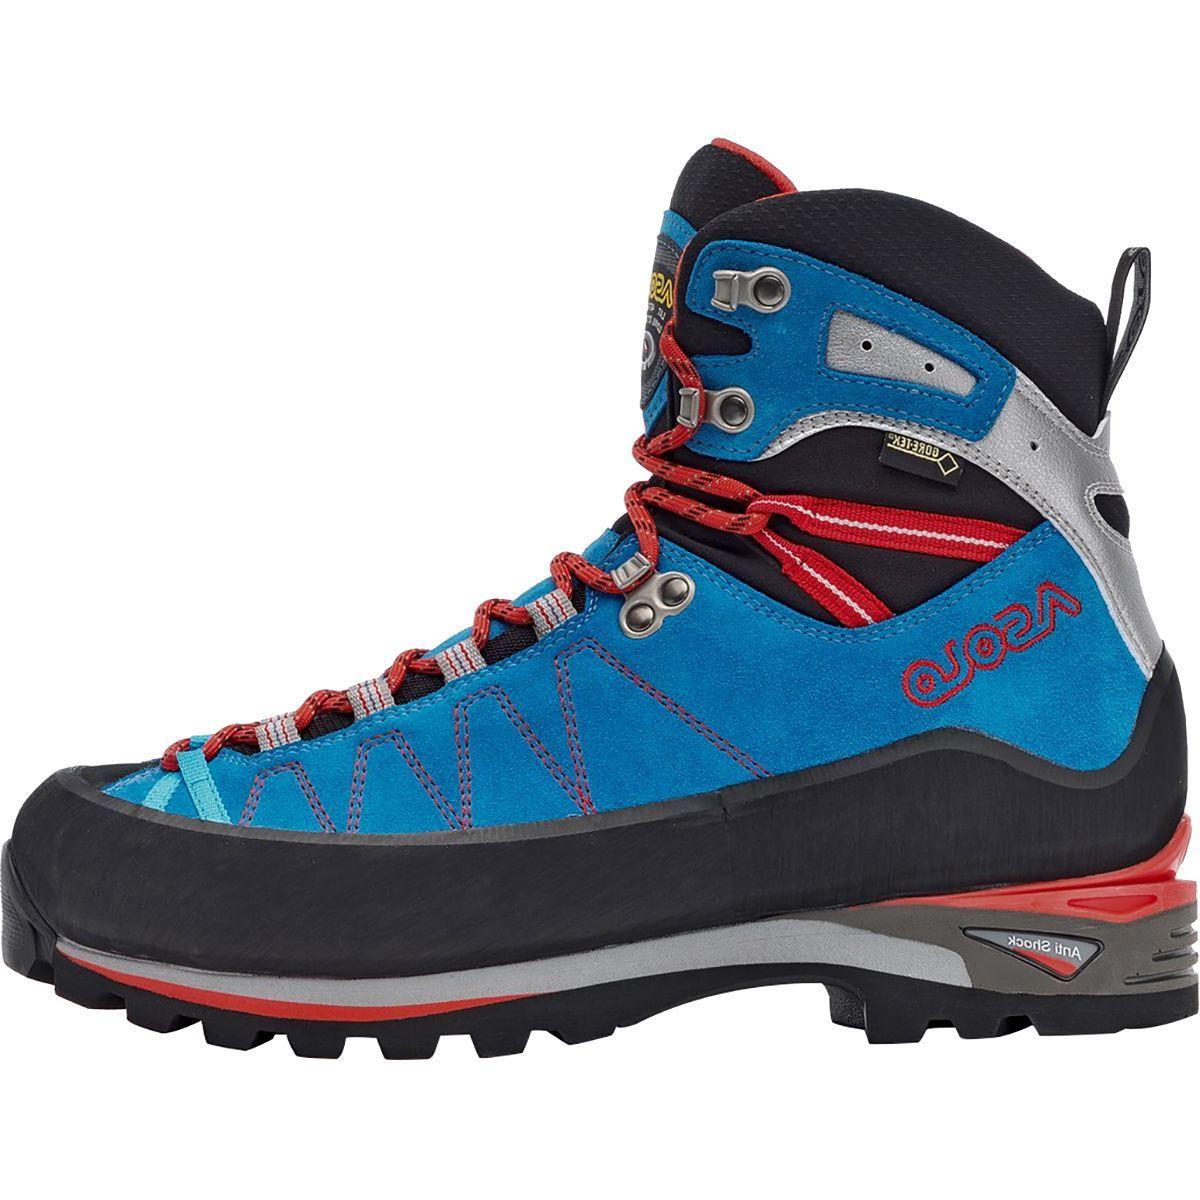 Asolo Elbrus GV Mountaineering Boot - Men's